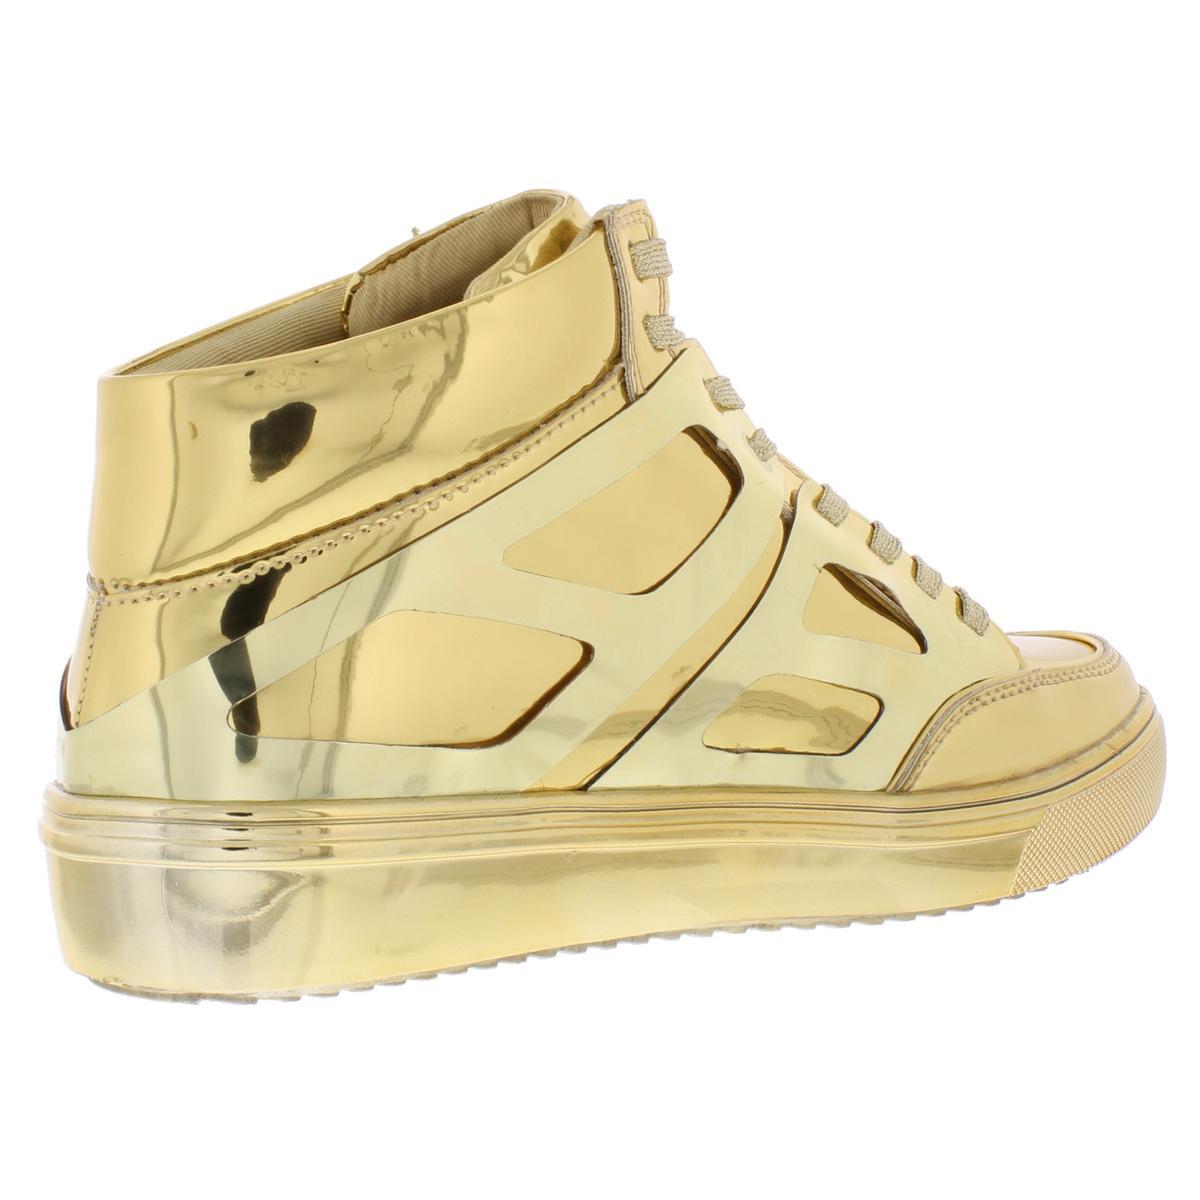 Steve-Madden-Womens-Tinman-2-Metallic-High-Top-Fashion-Sneakers-Shoes-BHFO-9056 thumbnail 4